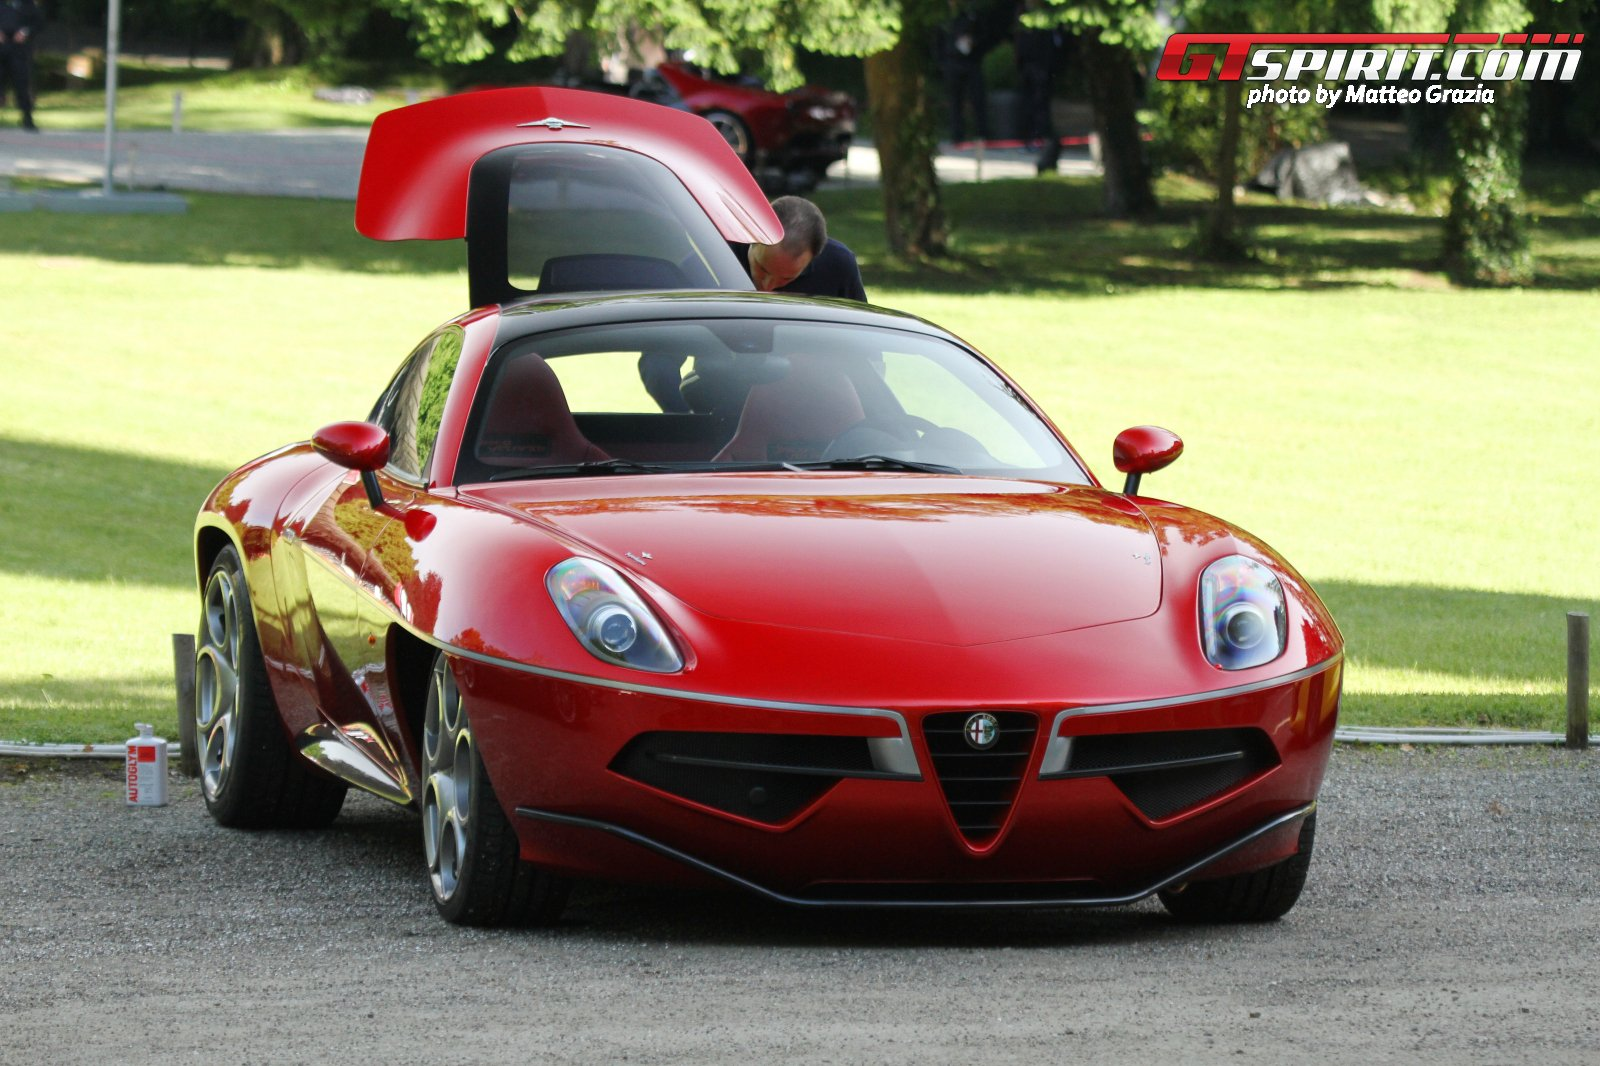 Alfa Romeo Disco Volante Wins Design Award For Concept Cars And